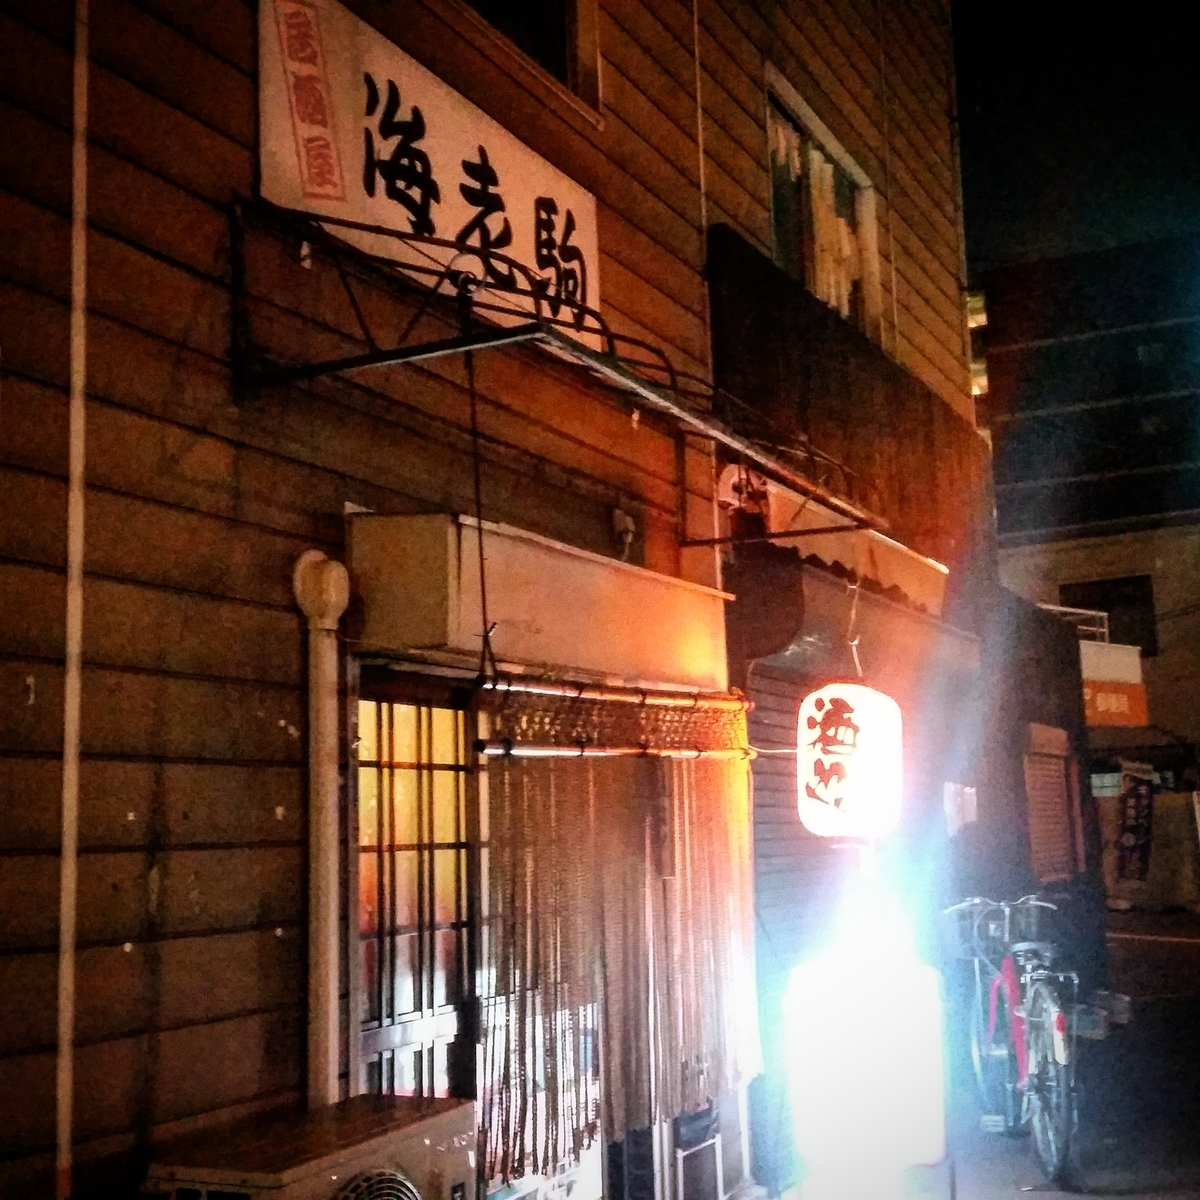 f:id:ichigo-ichie411211:20190421094520j:plain